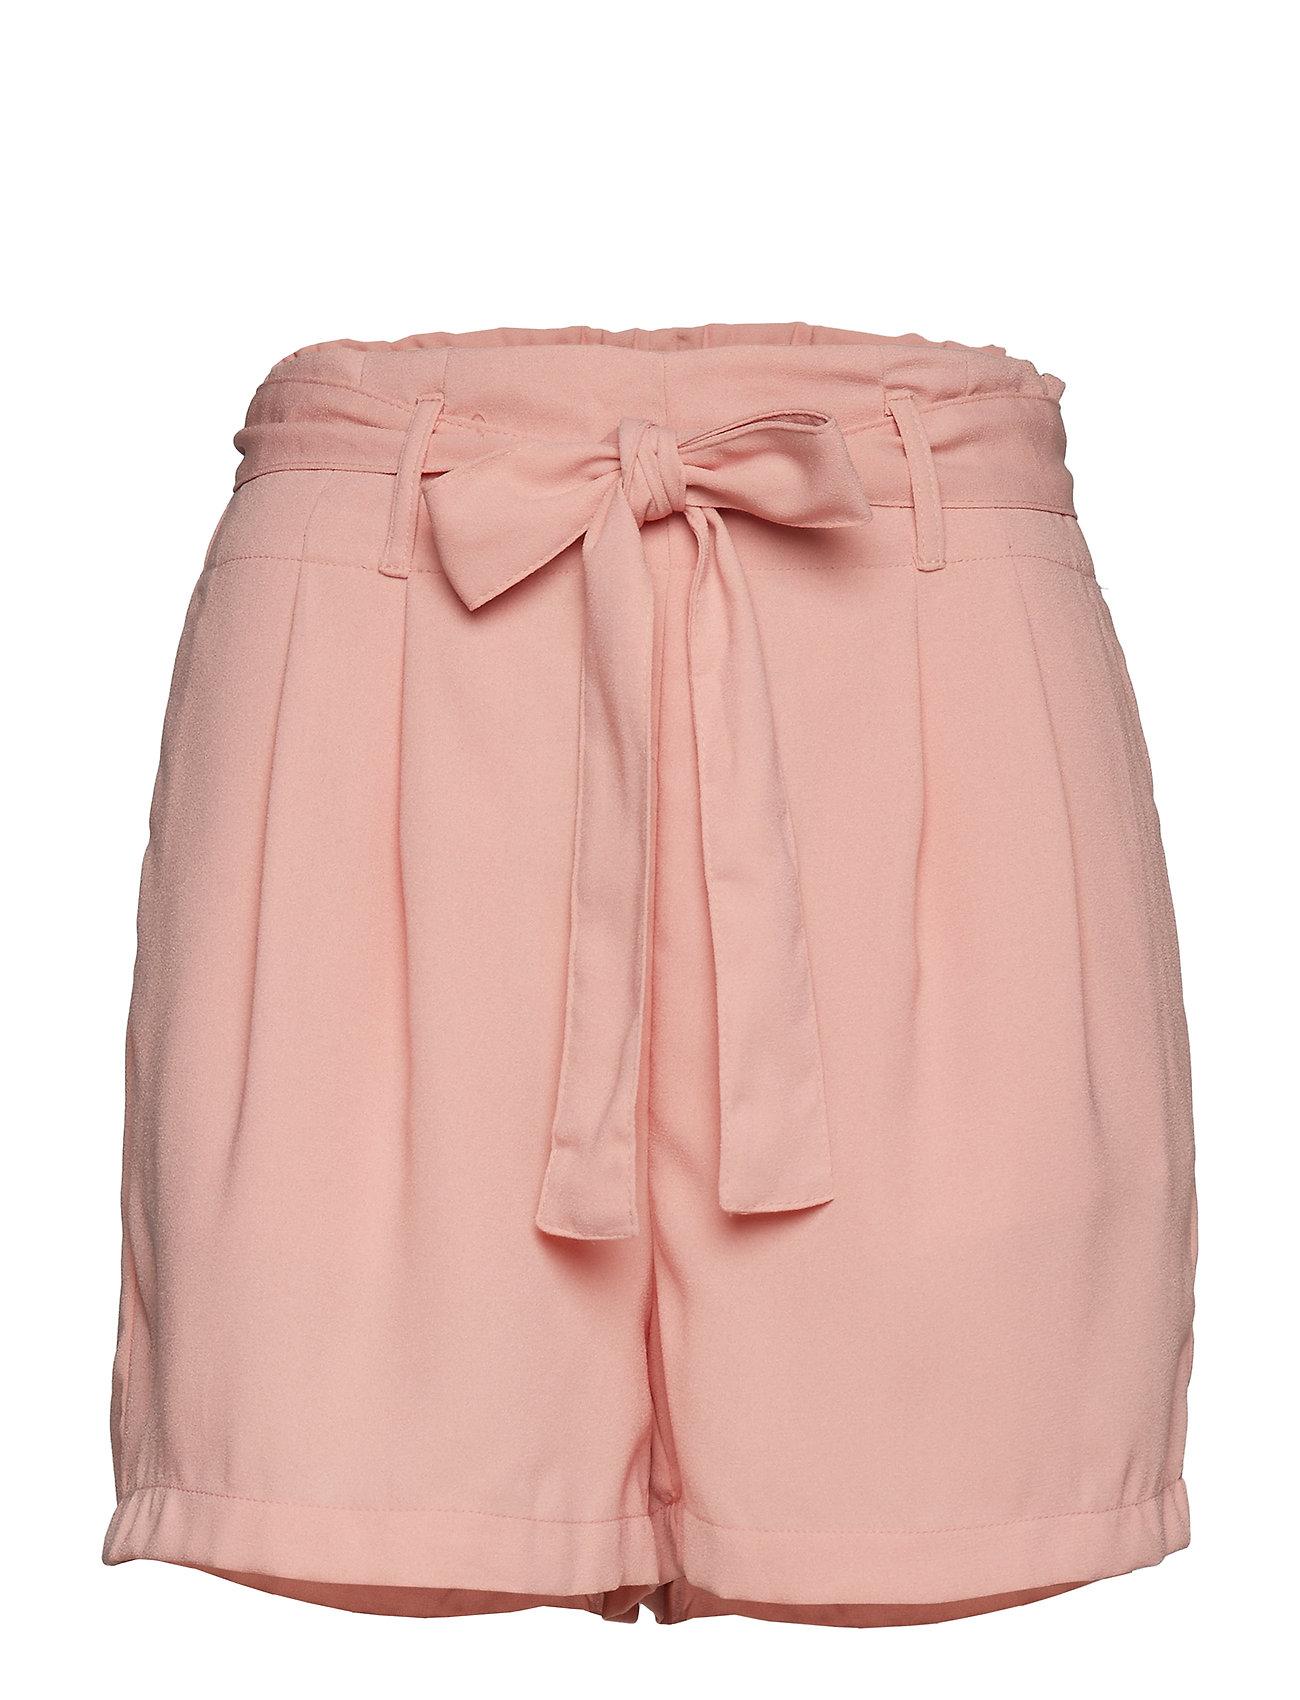 Gina Tricot Irma shorts - CORAL ALMOND